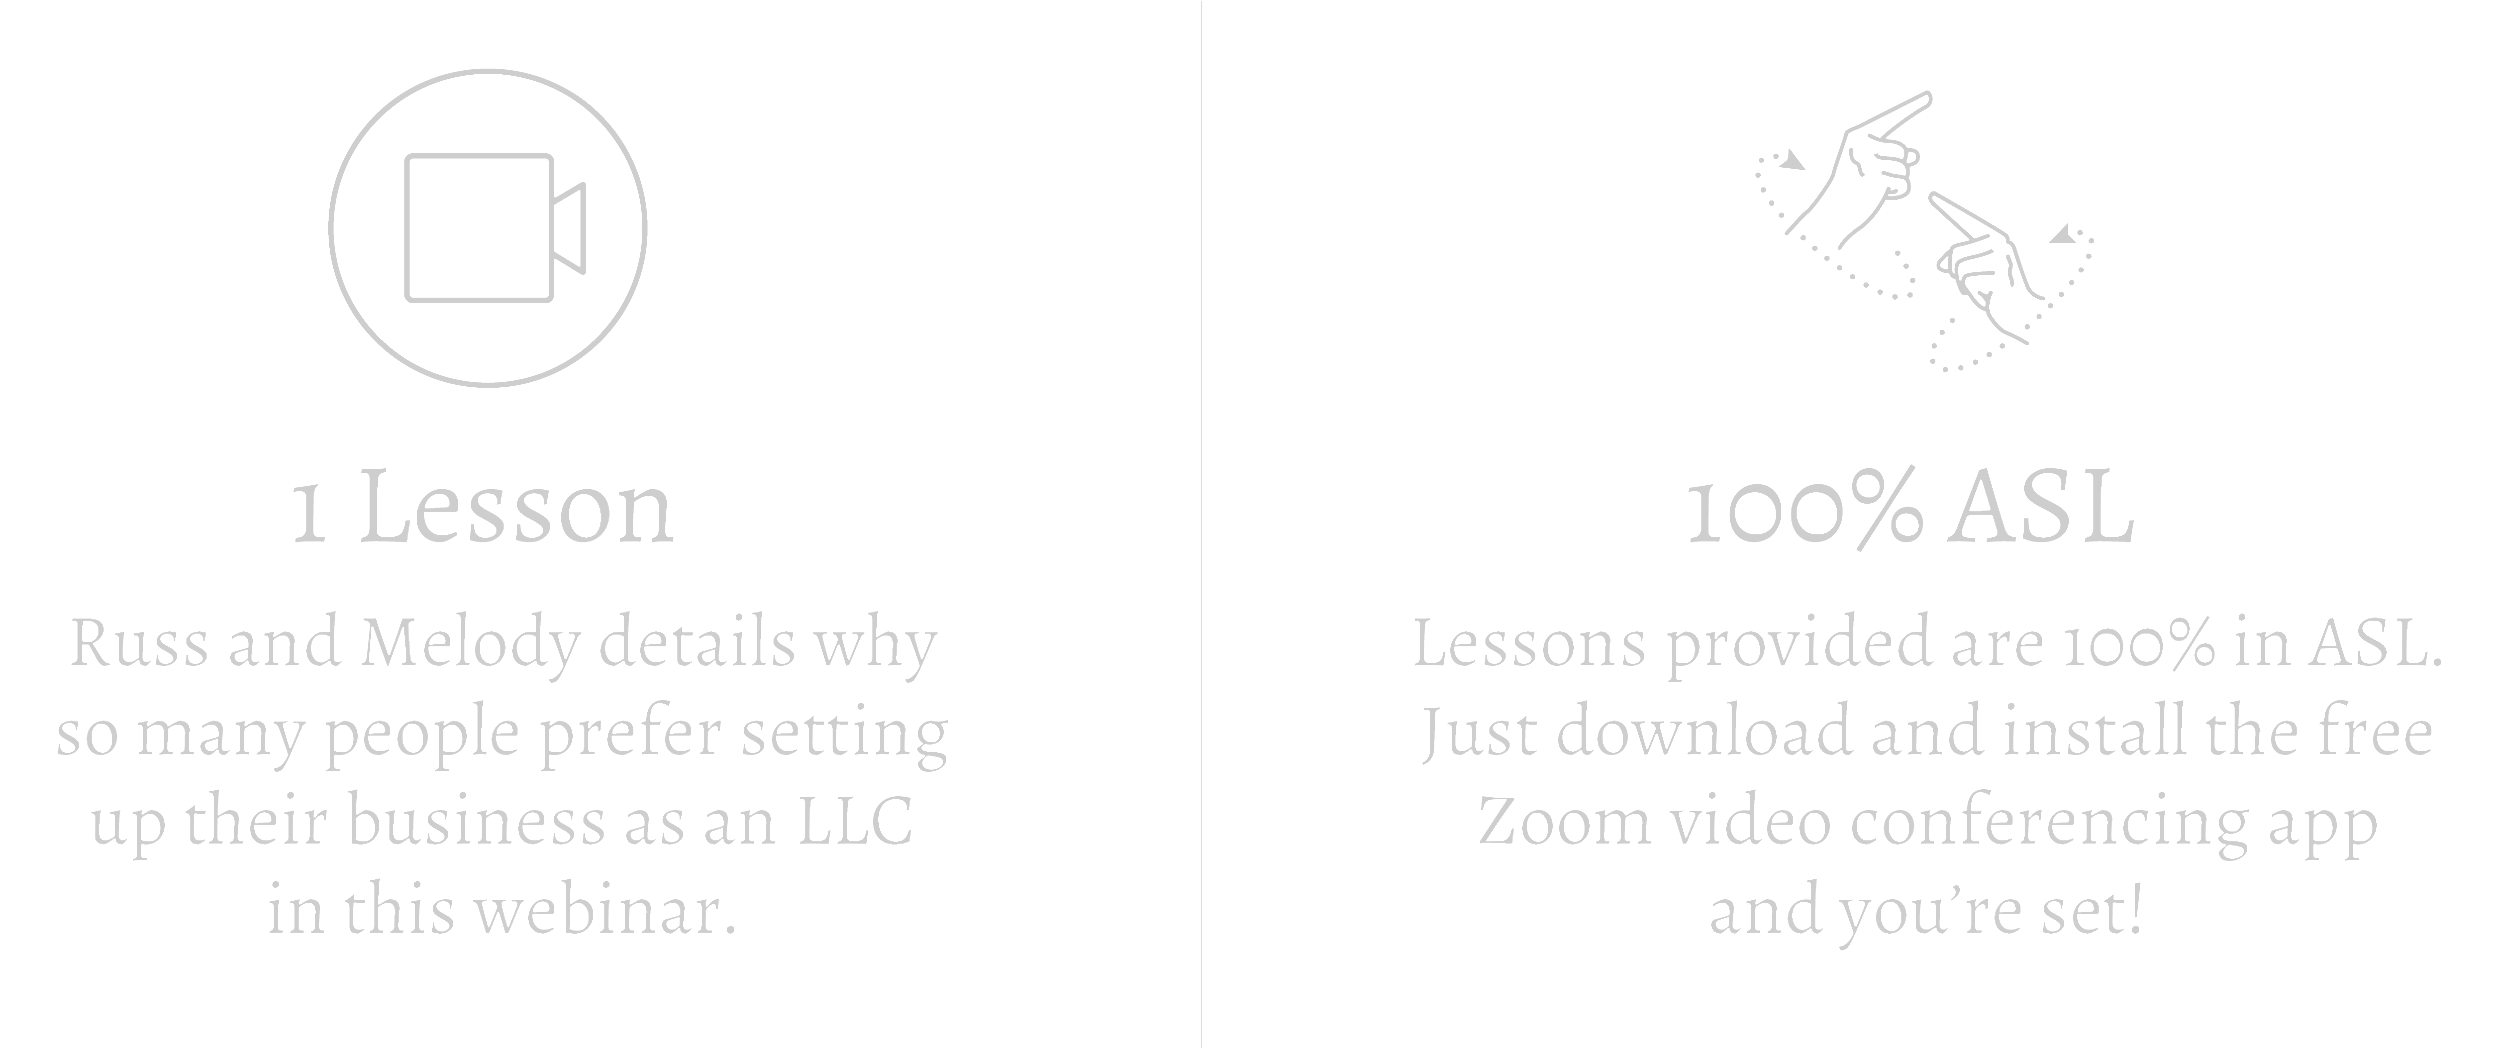 Webinar Details - Why People Prefer LLC-01.png